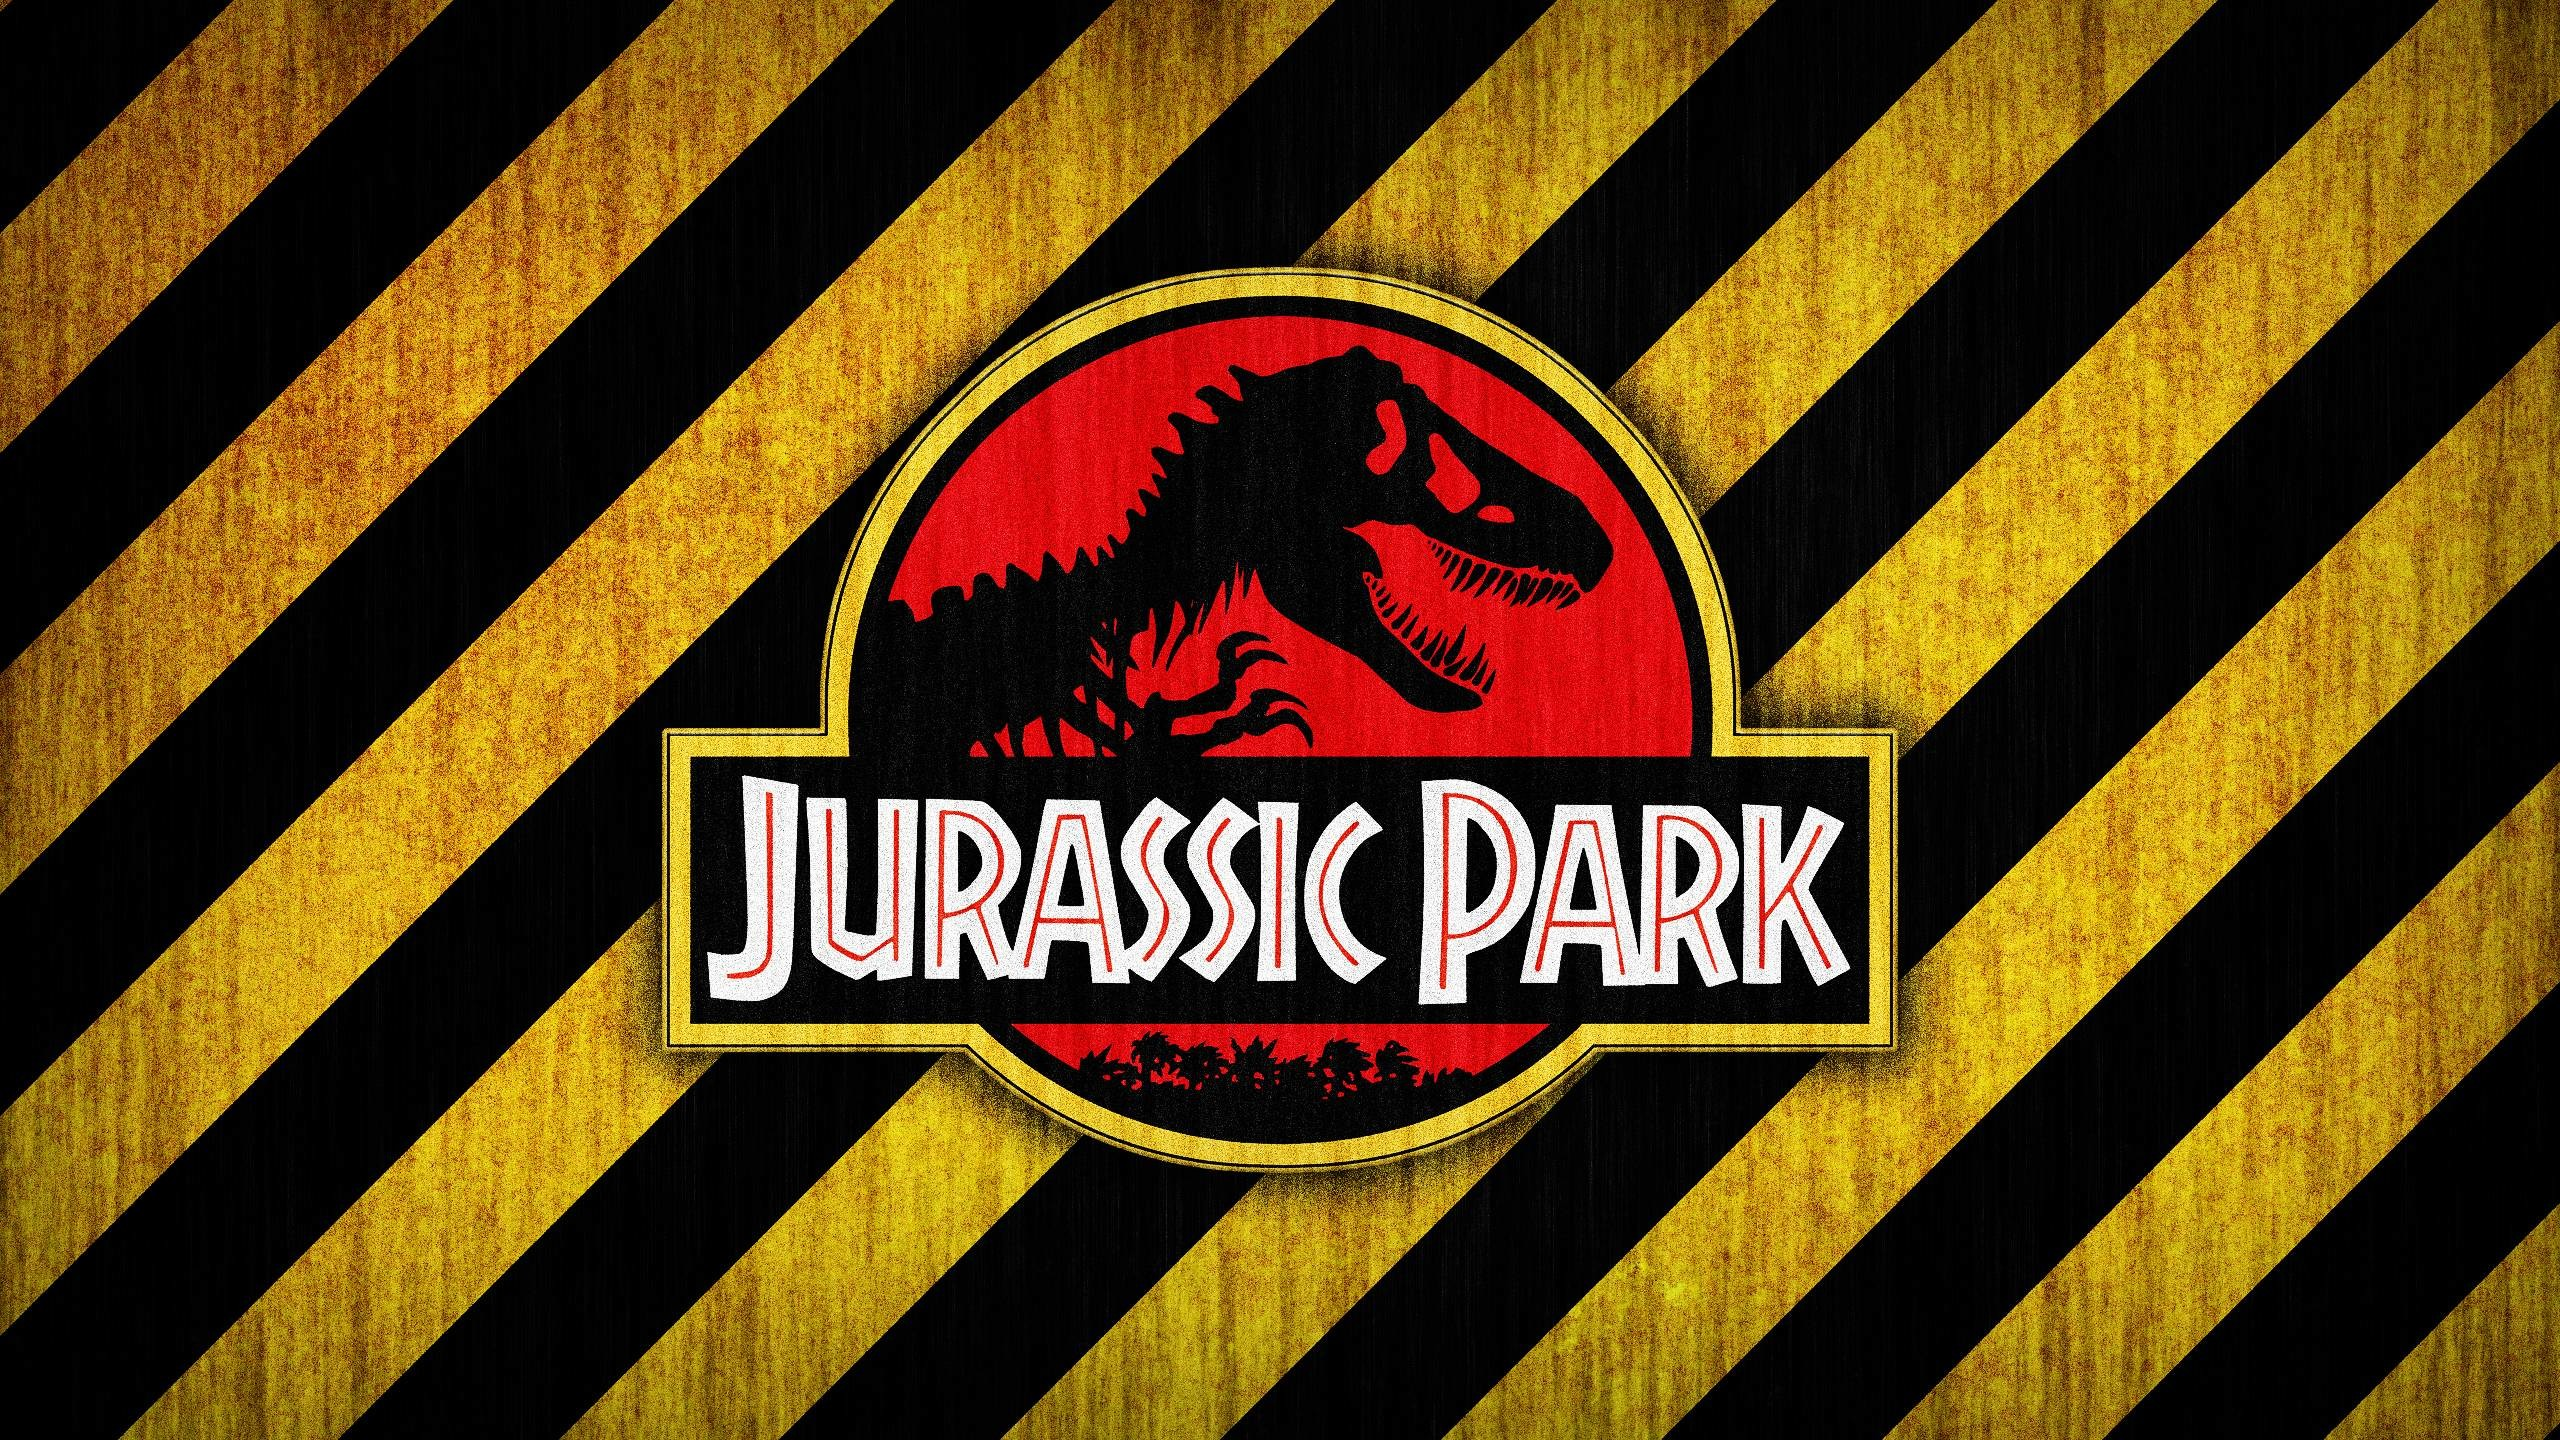 Jurassic park wallpaper wallpapertag - Jurassic park phone wallpaper ...